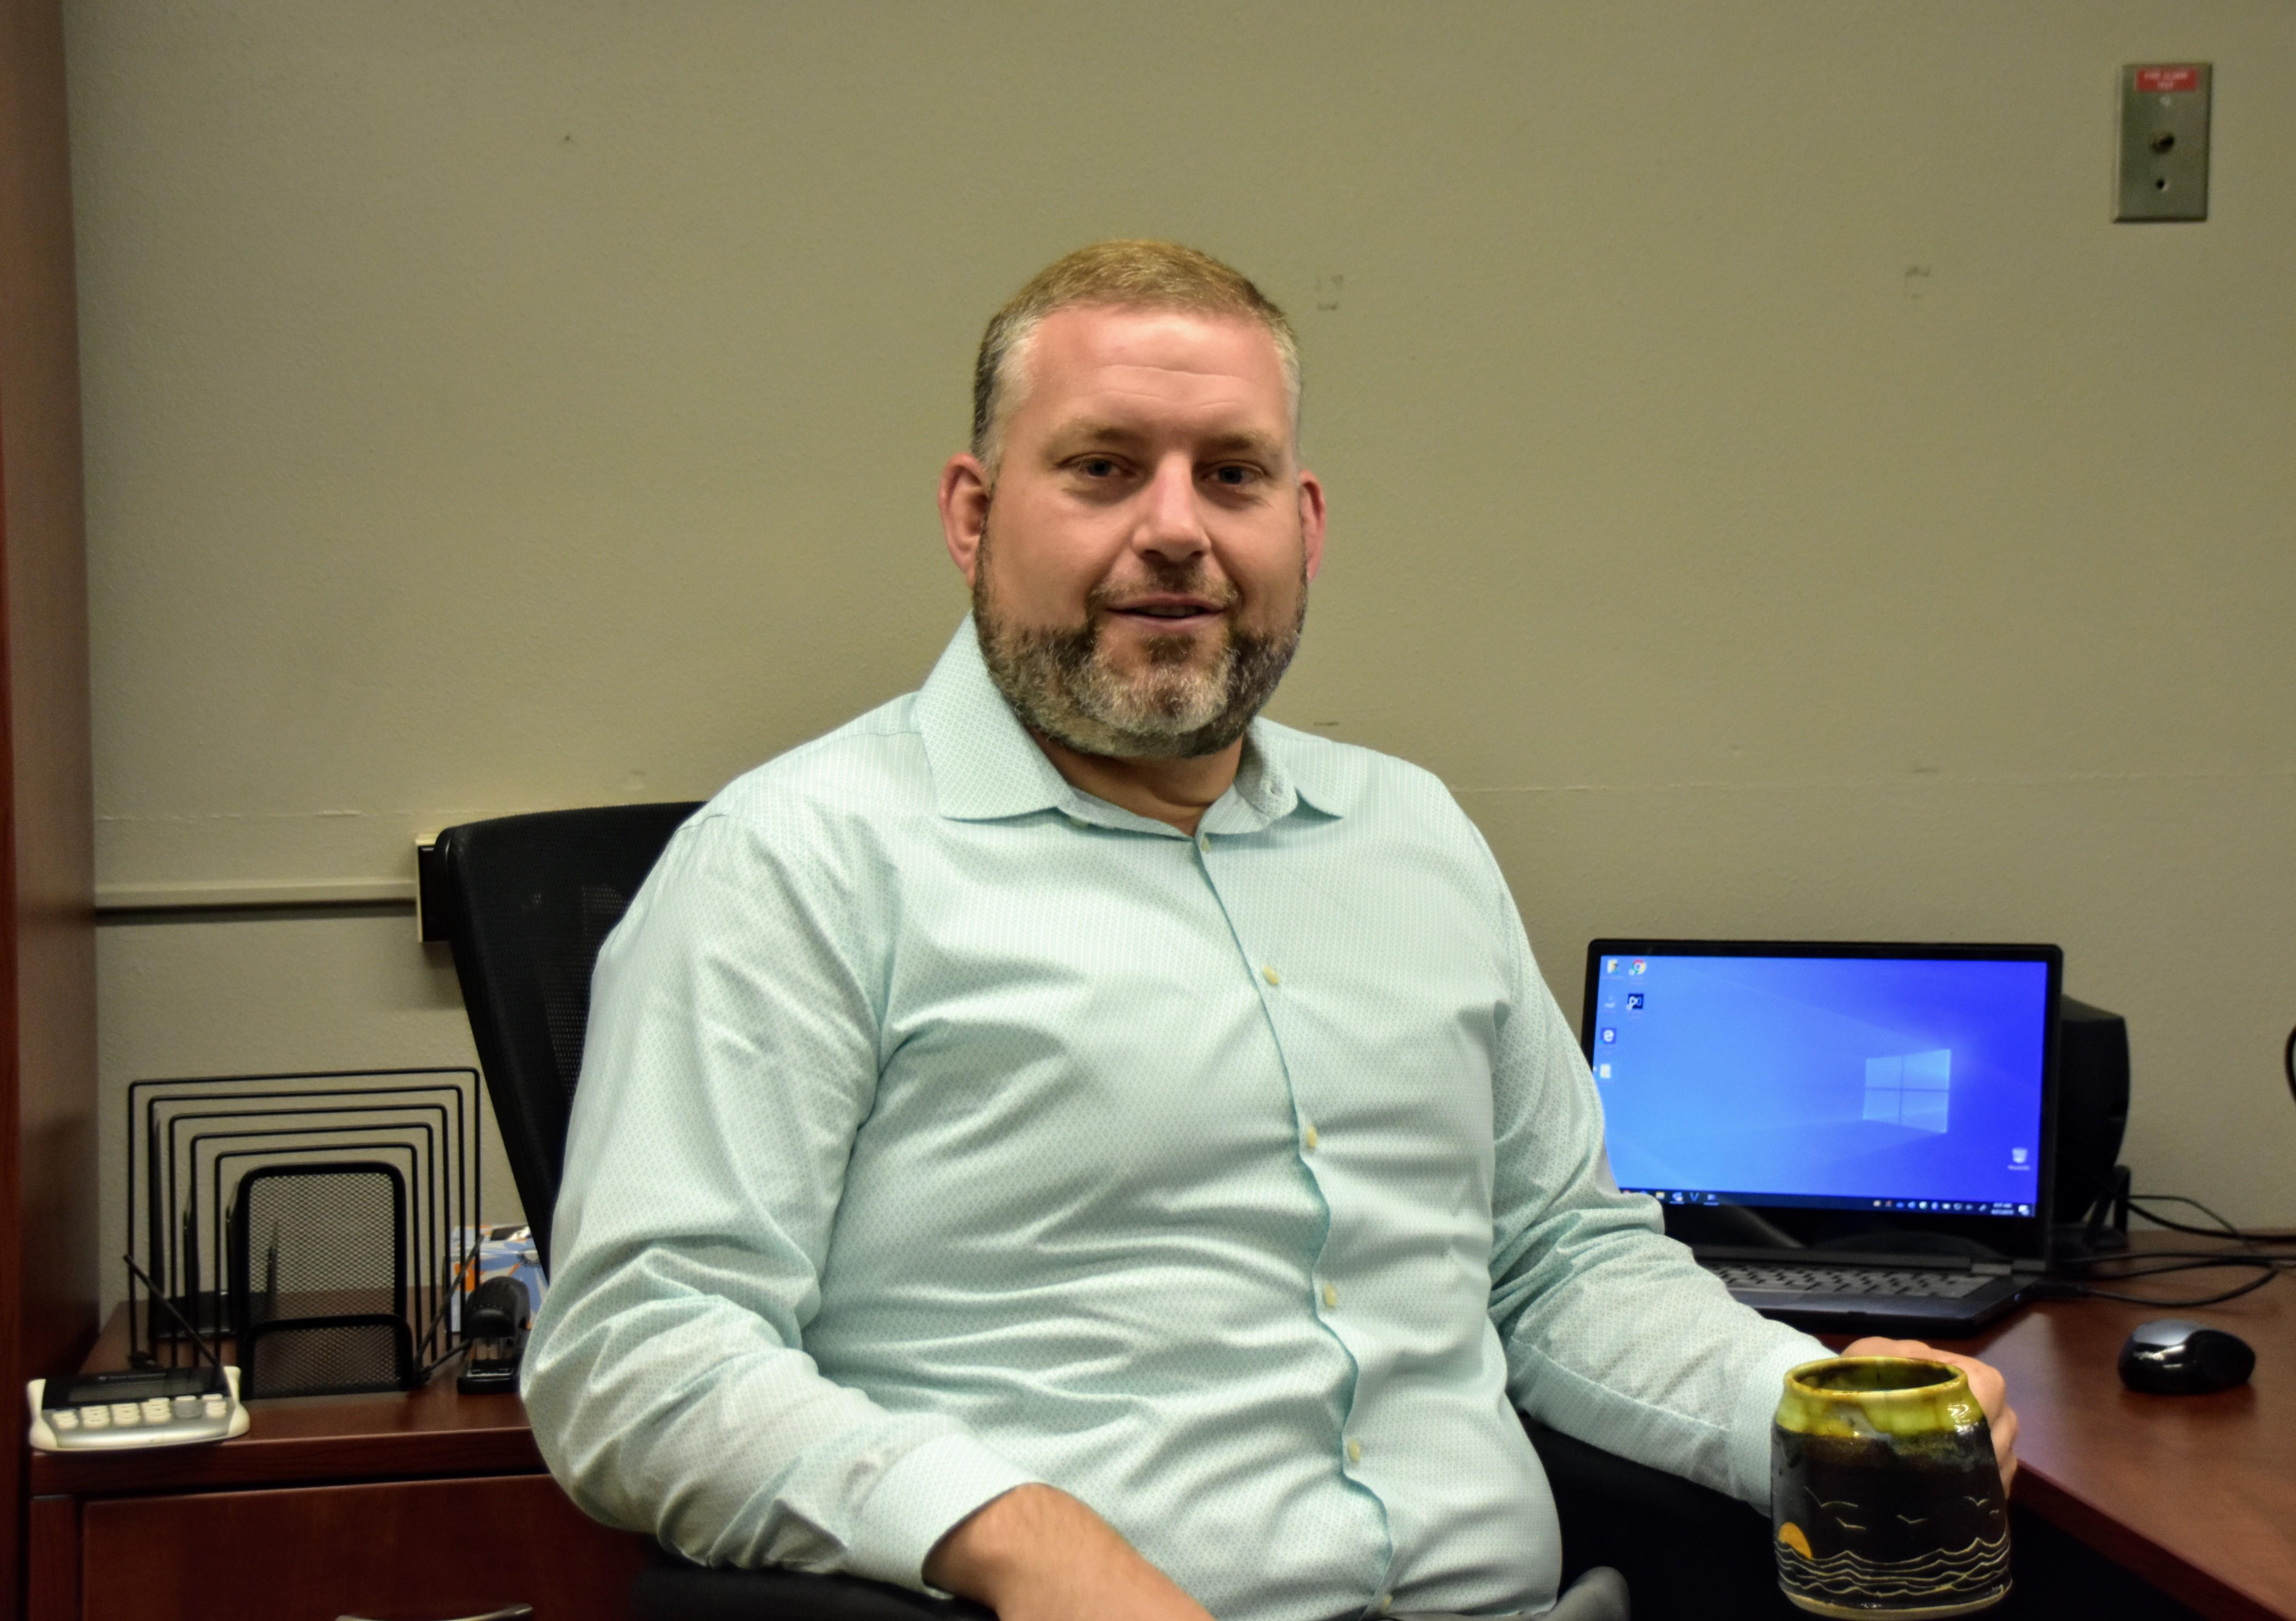 Principal Roberts